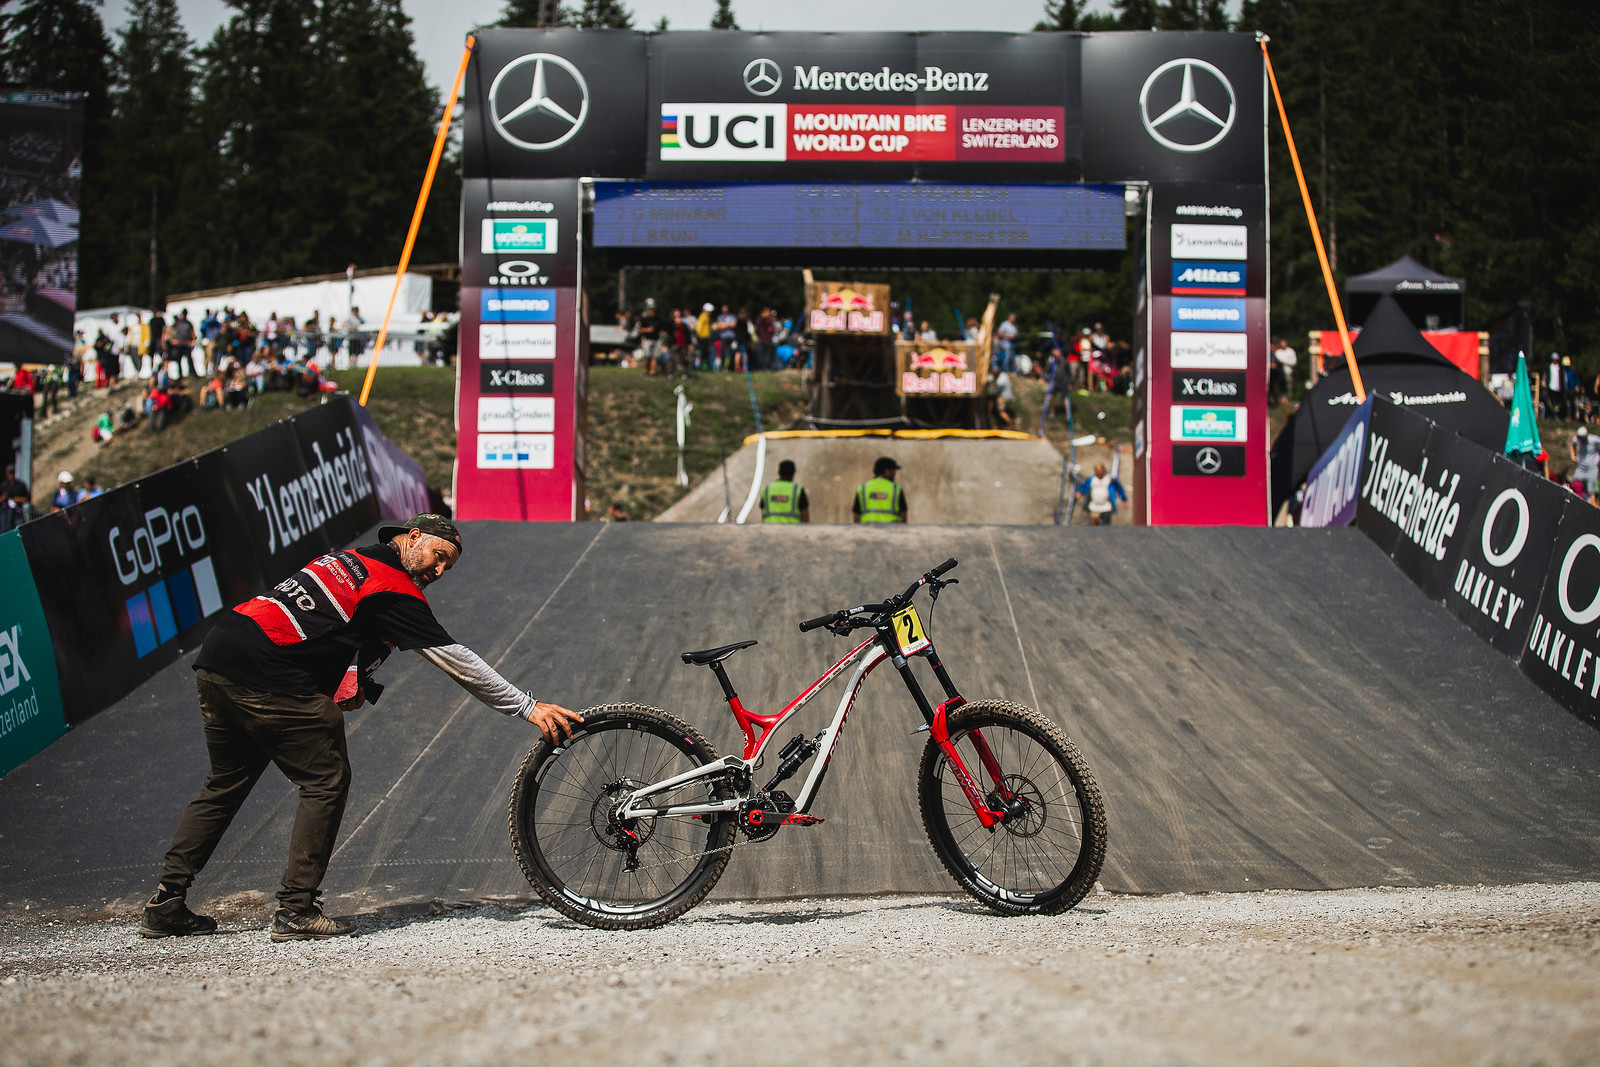 Making It Happen - WINNING BIKE - Amaury Pierron's Commencal Supreme DH - Mountain Biking Pictures - Vital MTB